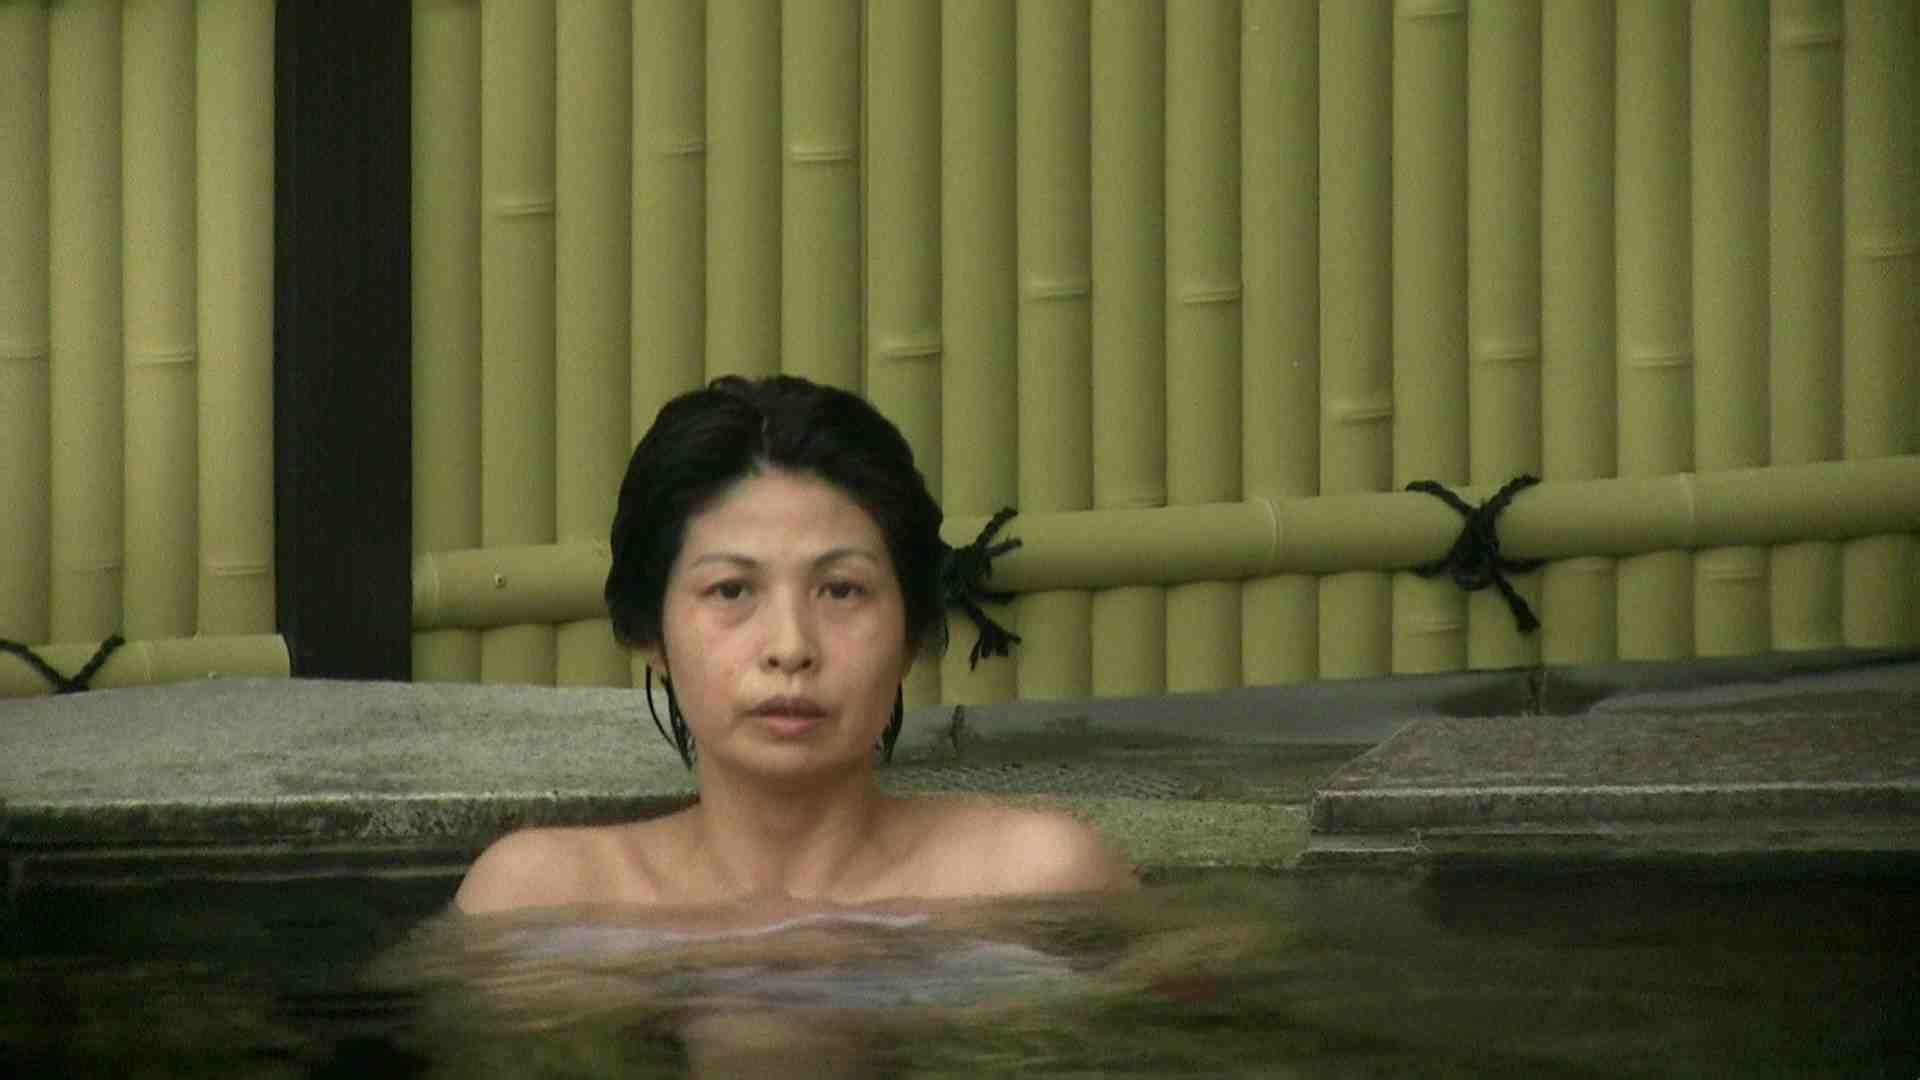 Aquaな露天風呂Vol.636 0 | 0  45連発 1